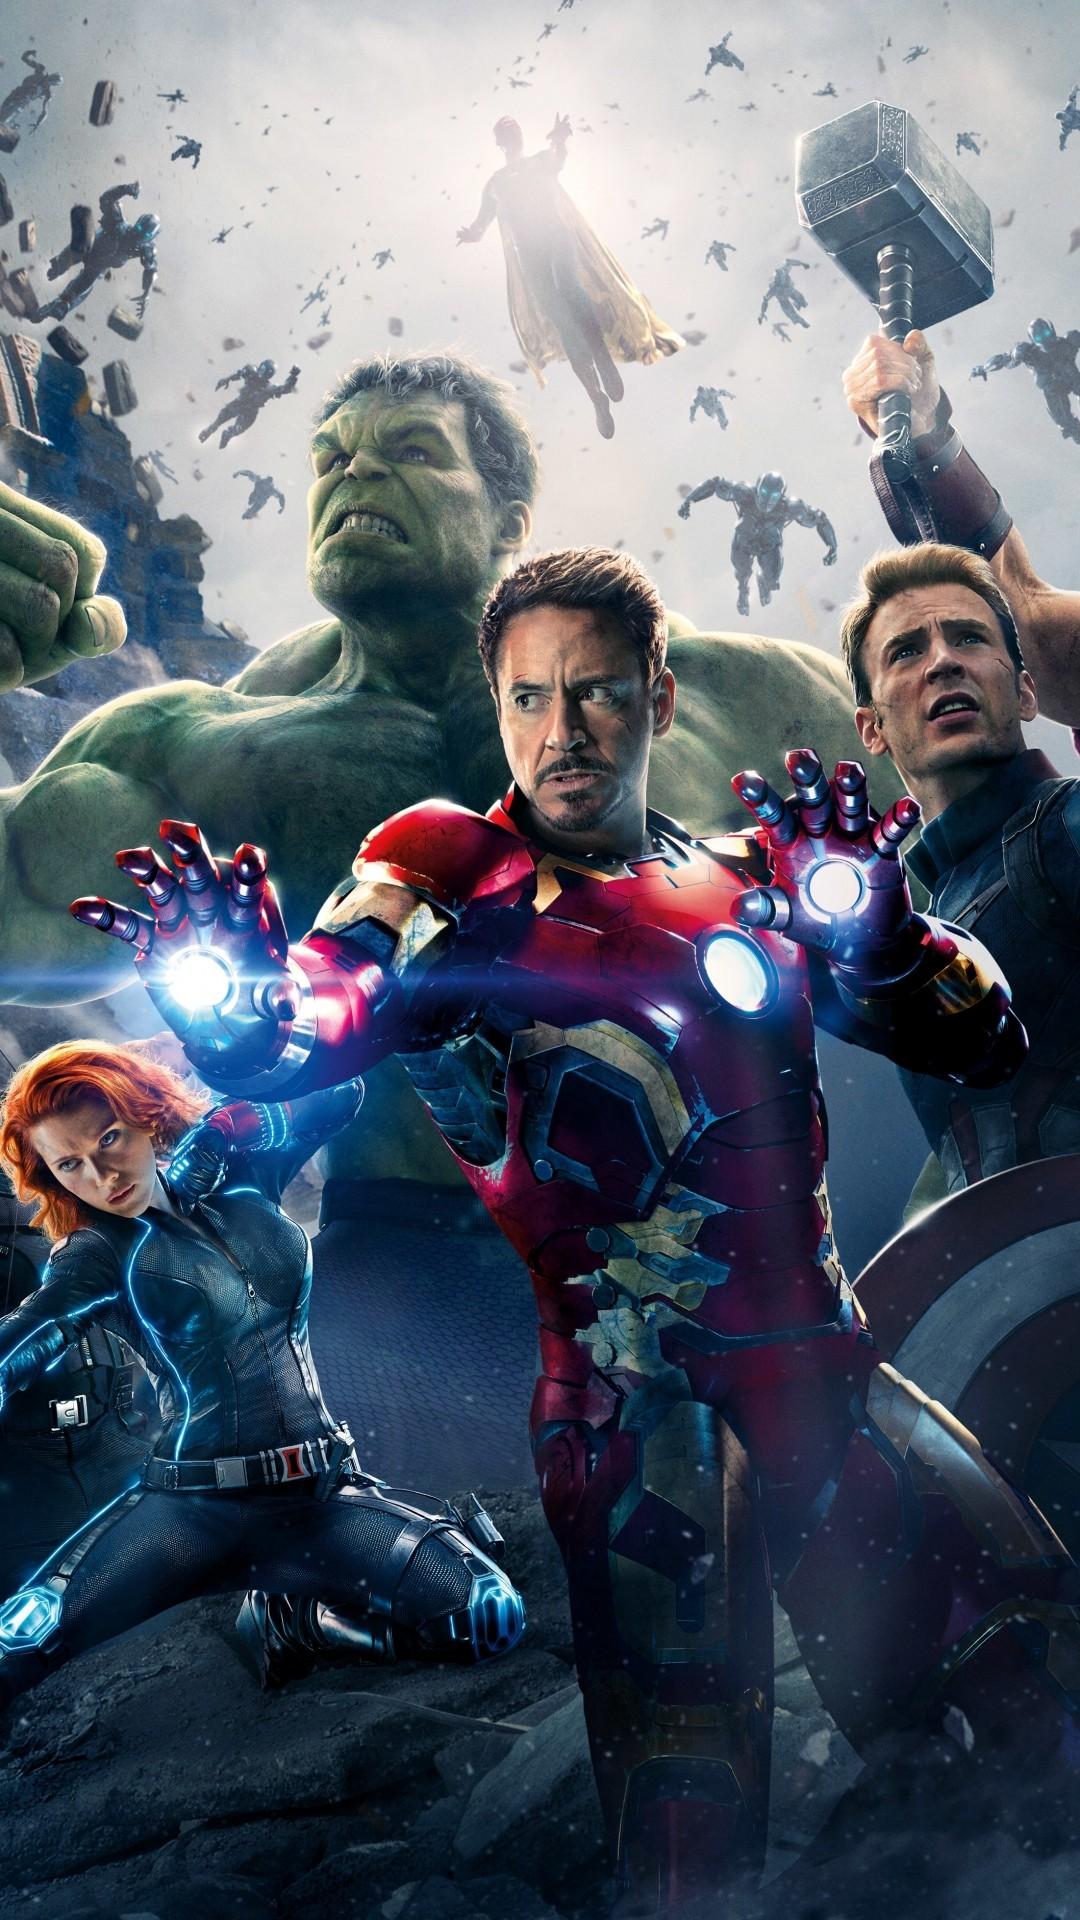 Avengers Iphone Full HD Wallpaper.